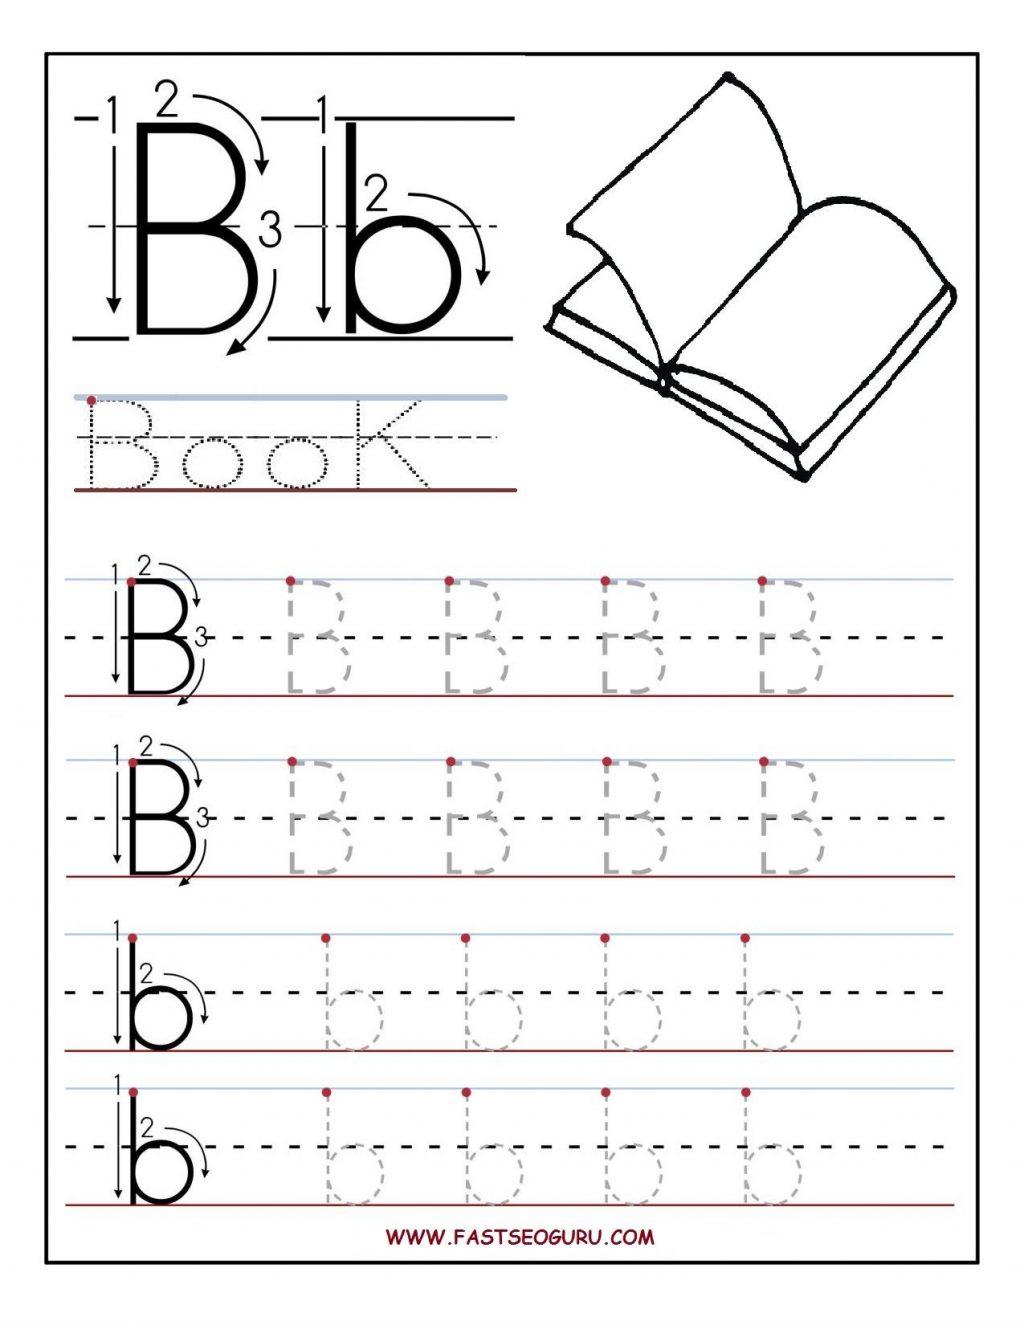 Worksheet ~ Free Pre K Printables Worksheet Printable Letter throughout Pre-K Alphabet Tracing Pages